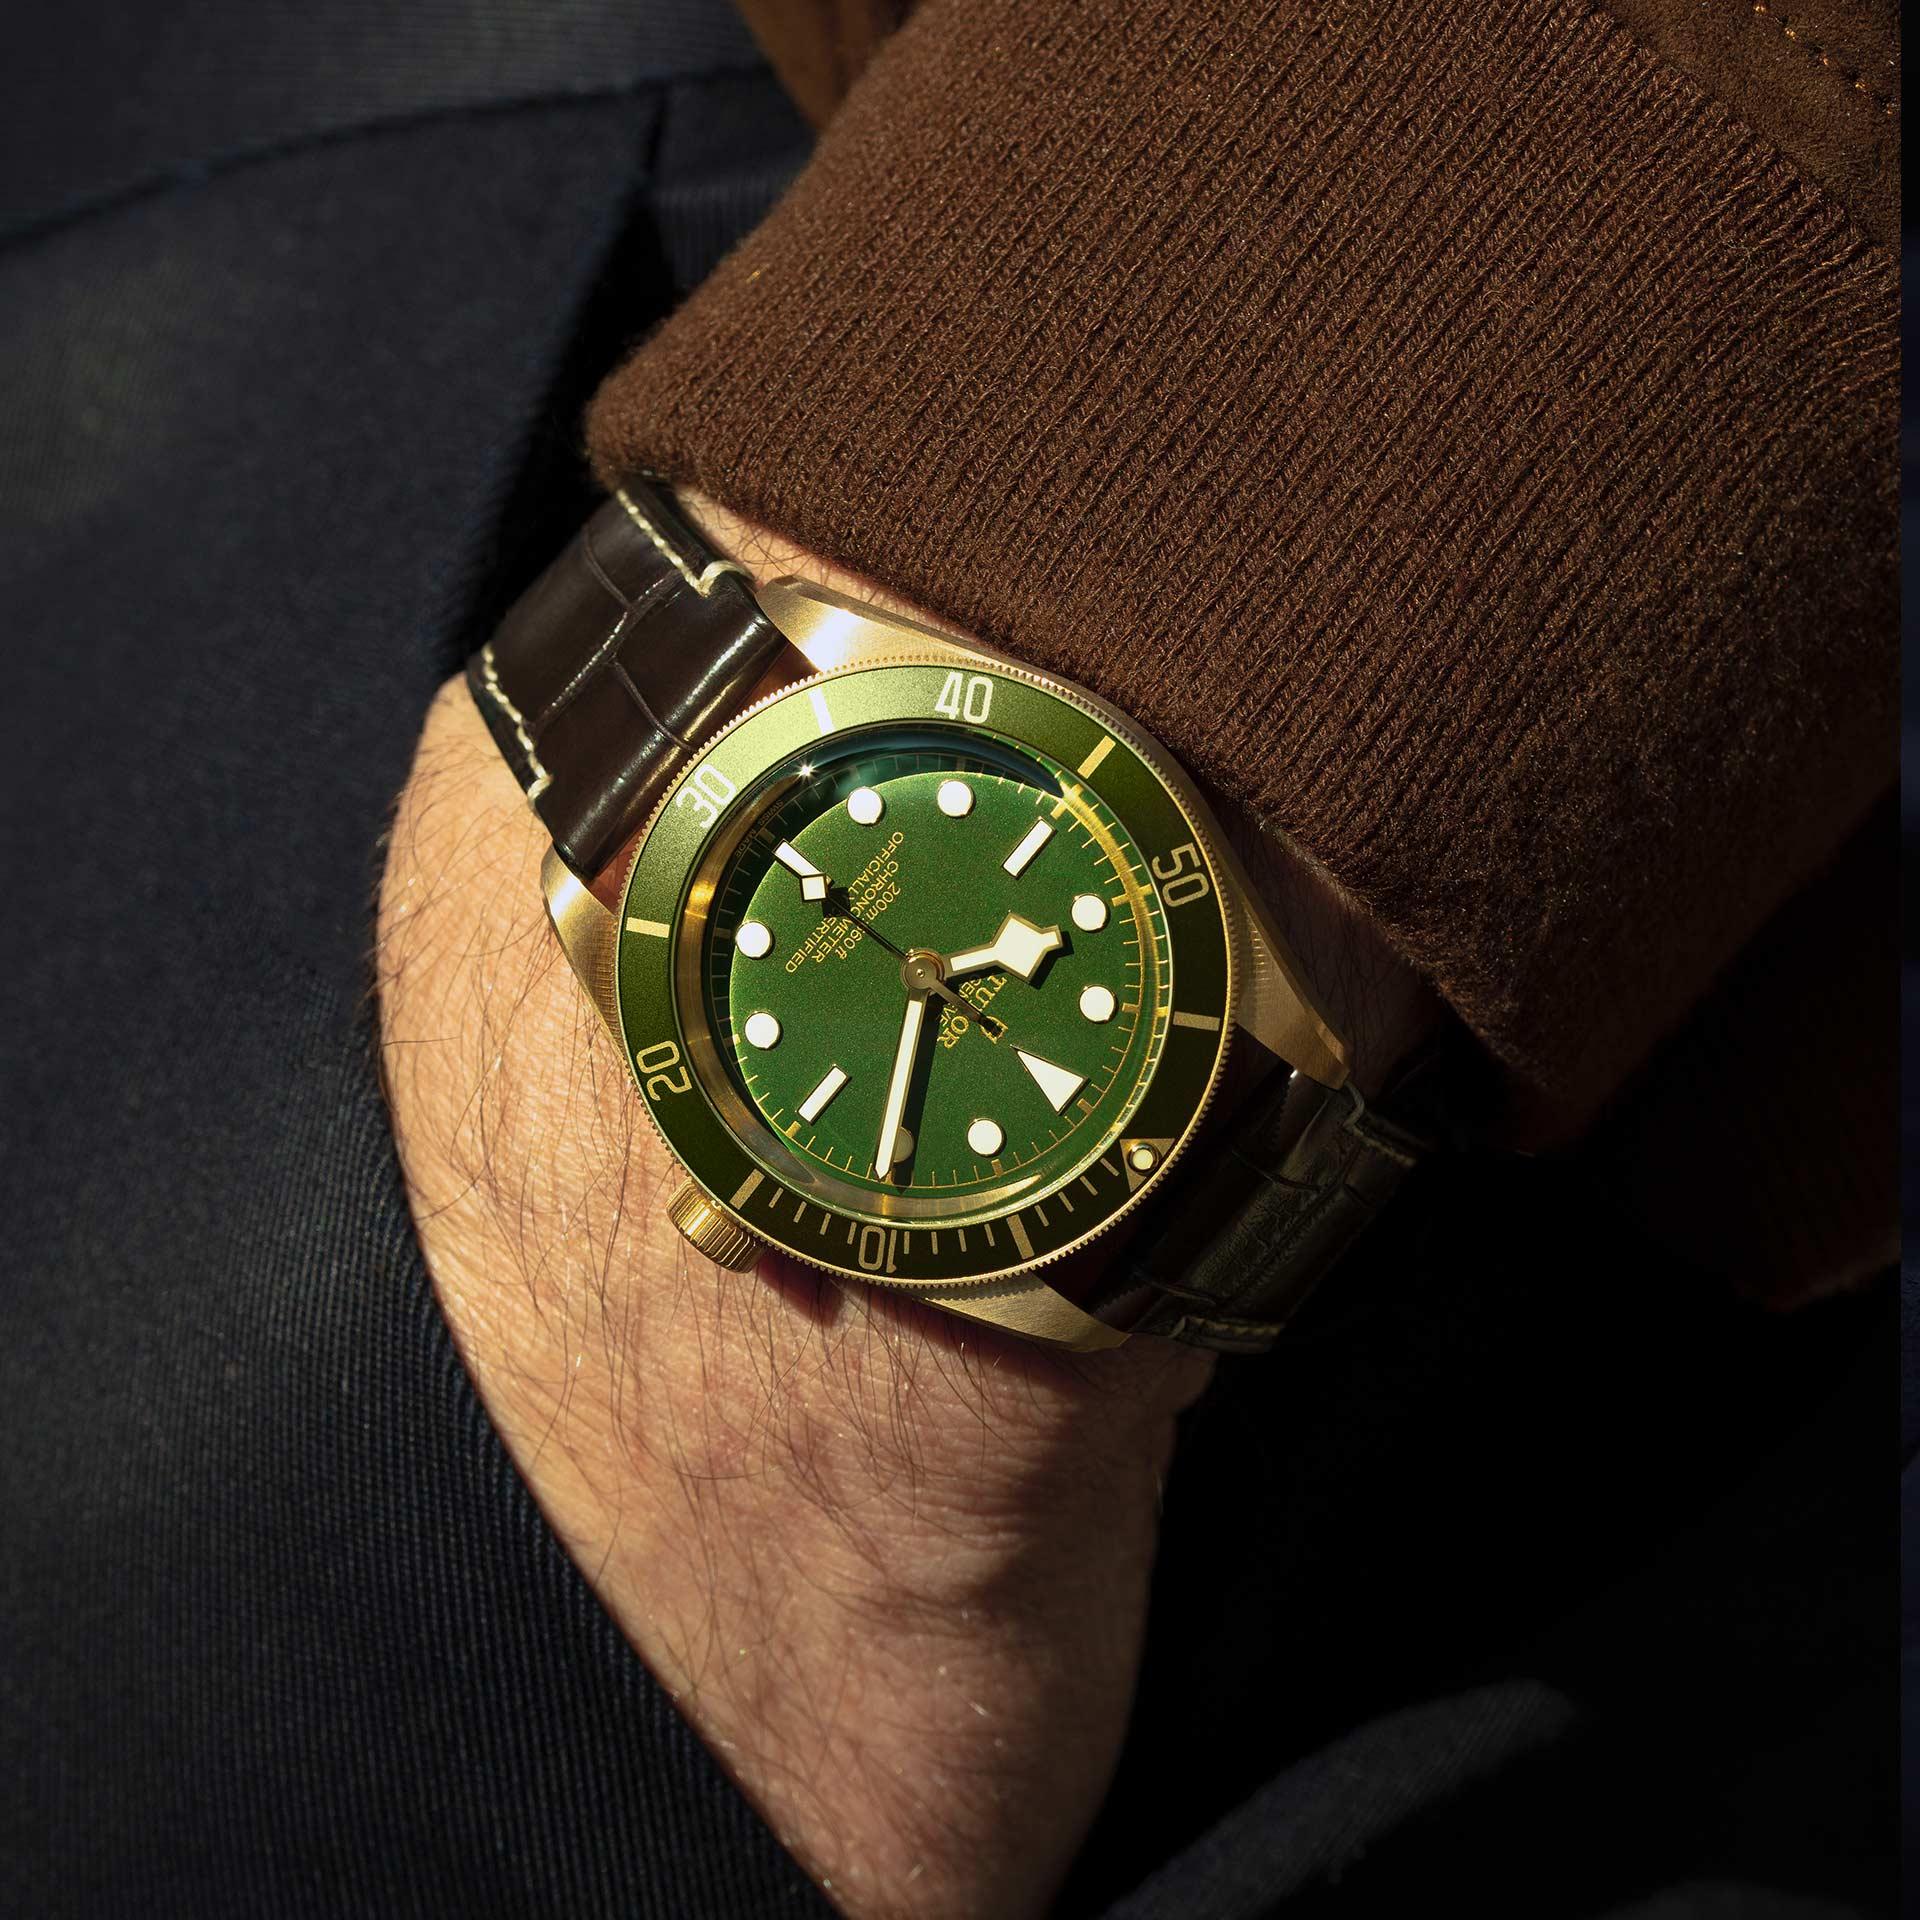 Tudor Black Bay Fifty-Eight 18K M79018V-0001 Lifestyle wristshot